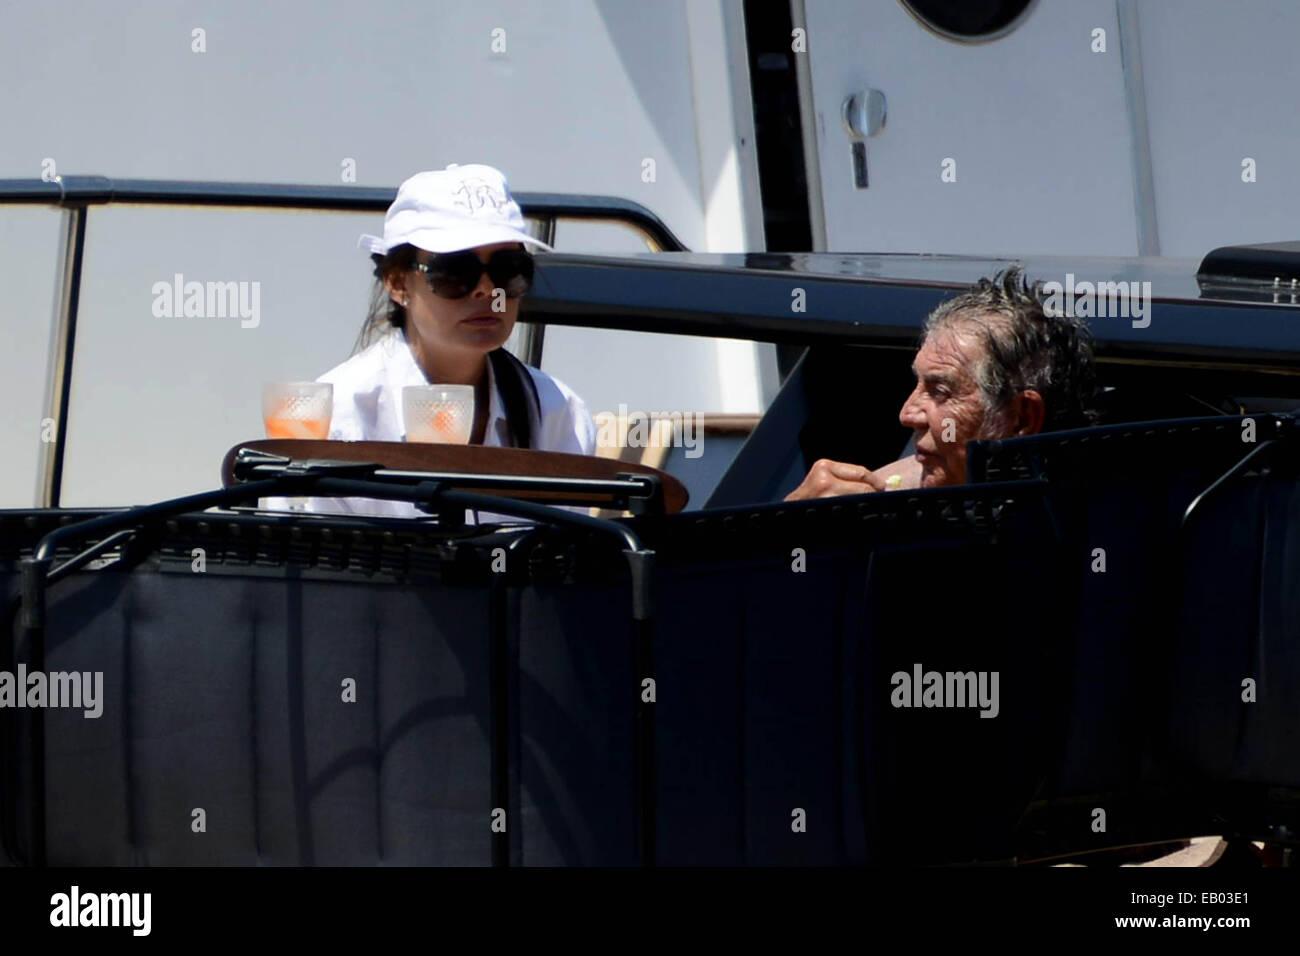 Italian Fashion Designer Roberto Cavalli Sunbathing On His Luxery Stock Photo 75605433 Alamy